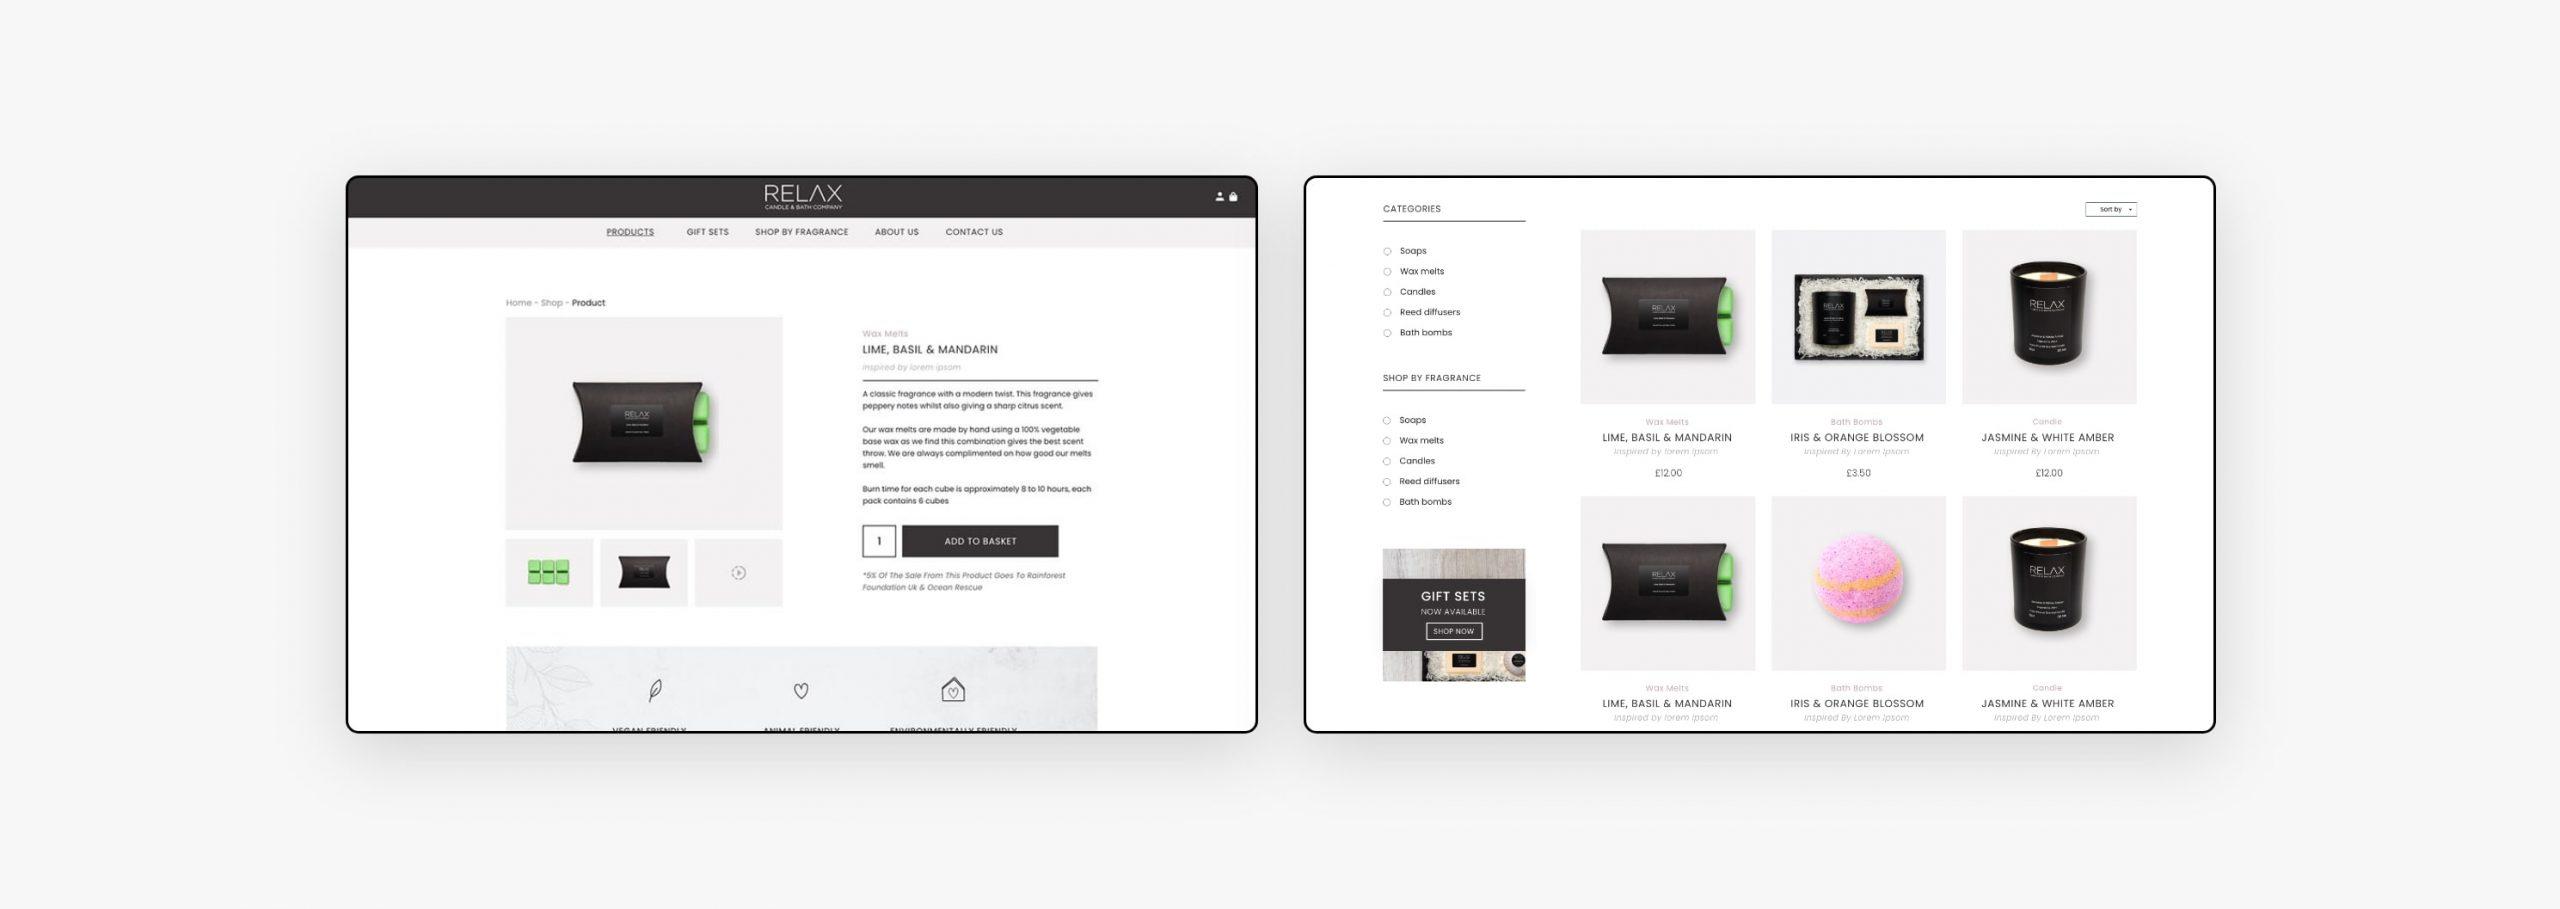 Web Design - Relax